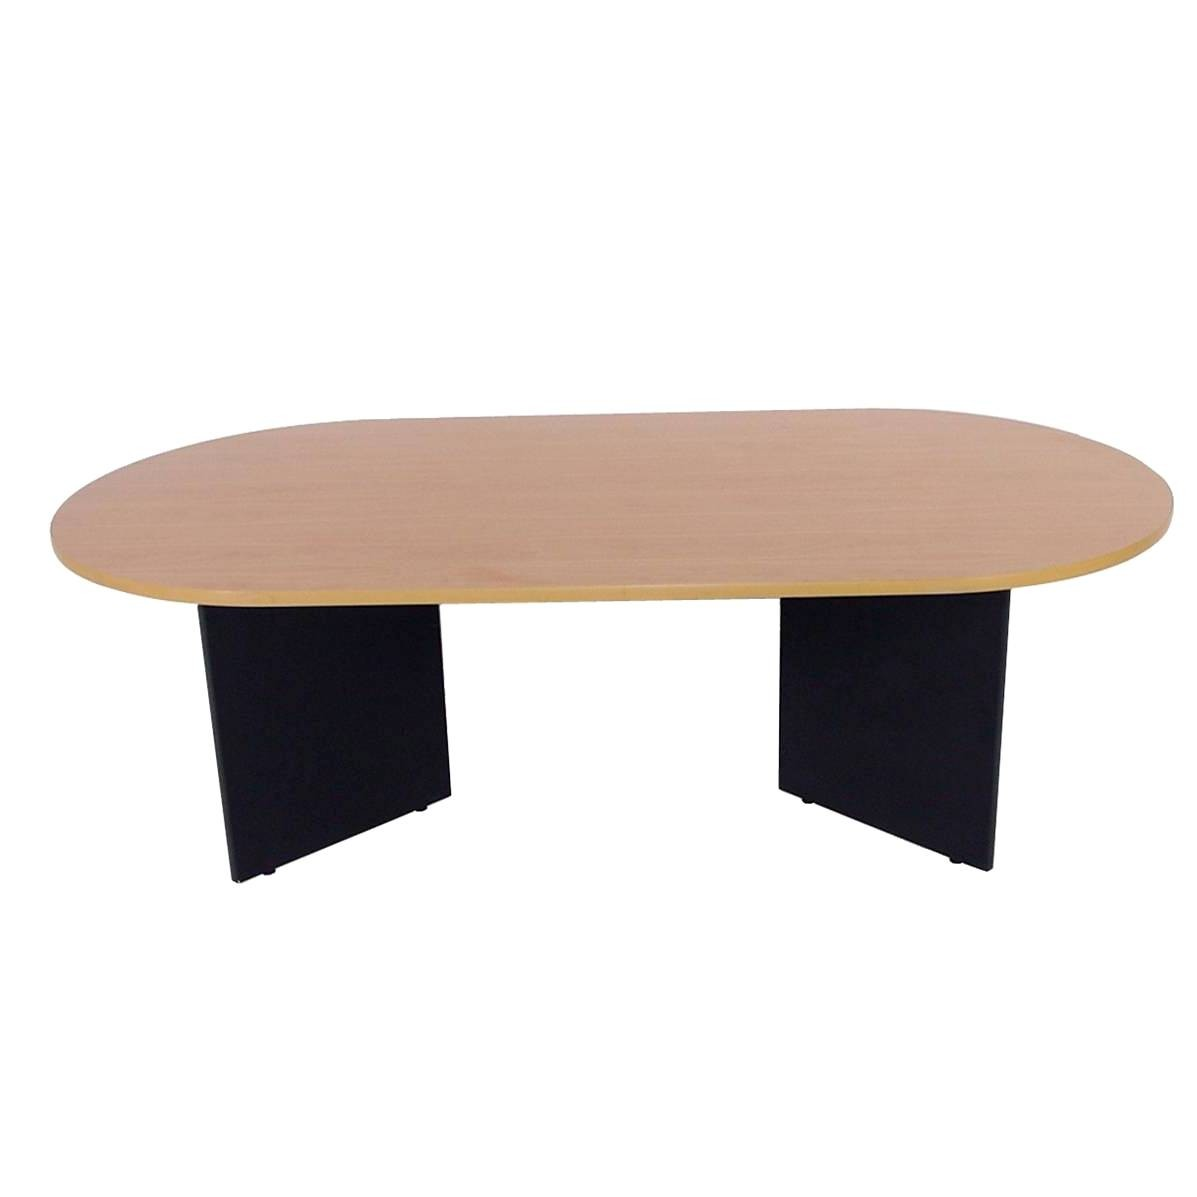 T4003 meeting boardroom table oxford tawa top black base 2400x1200